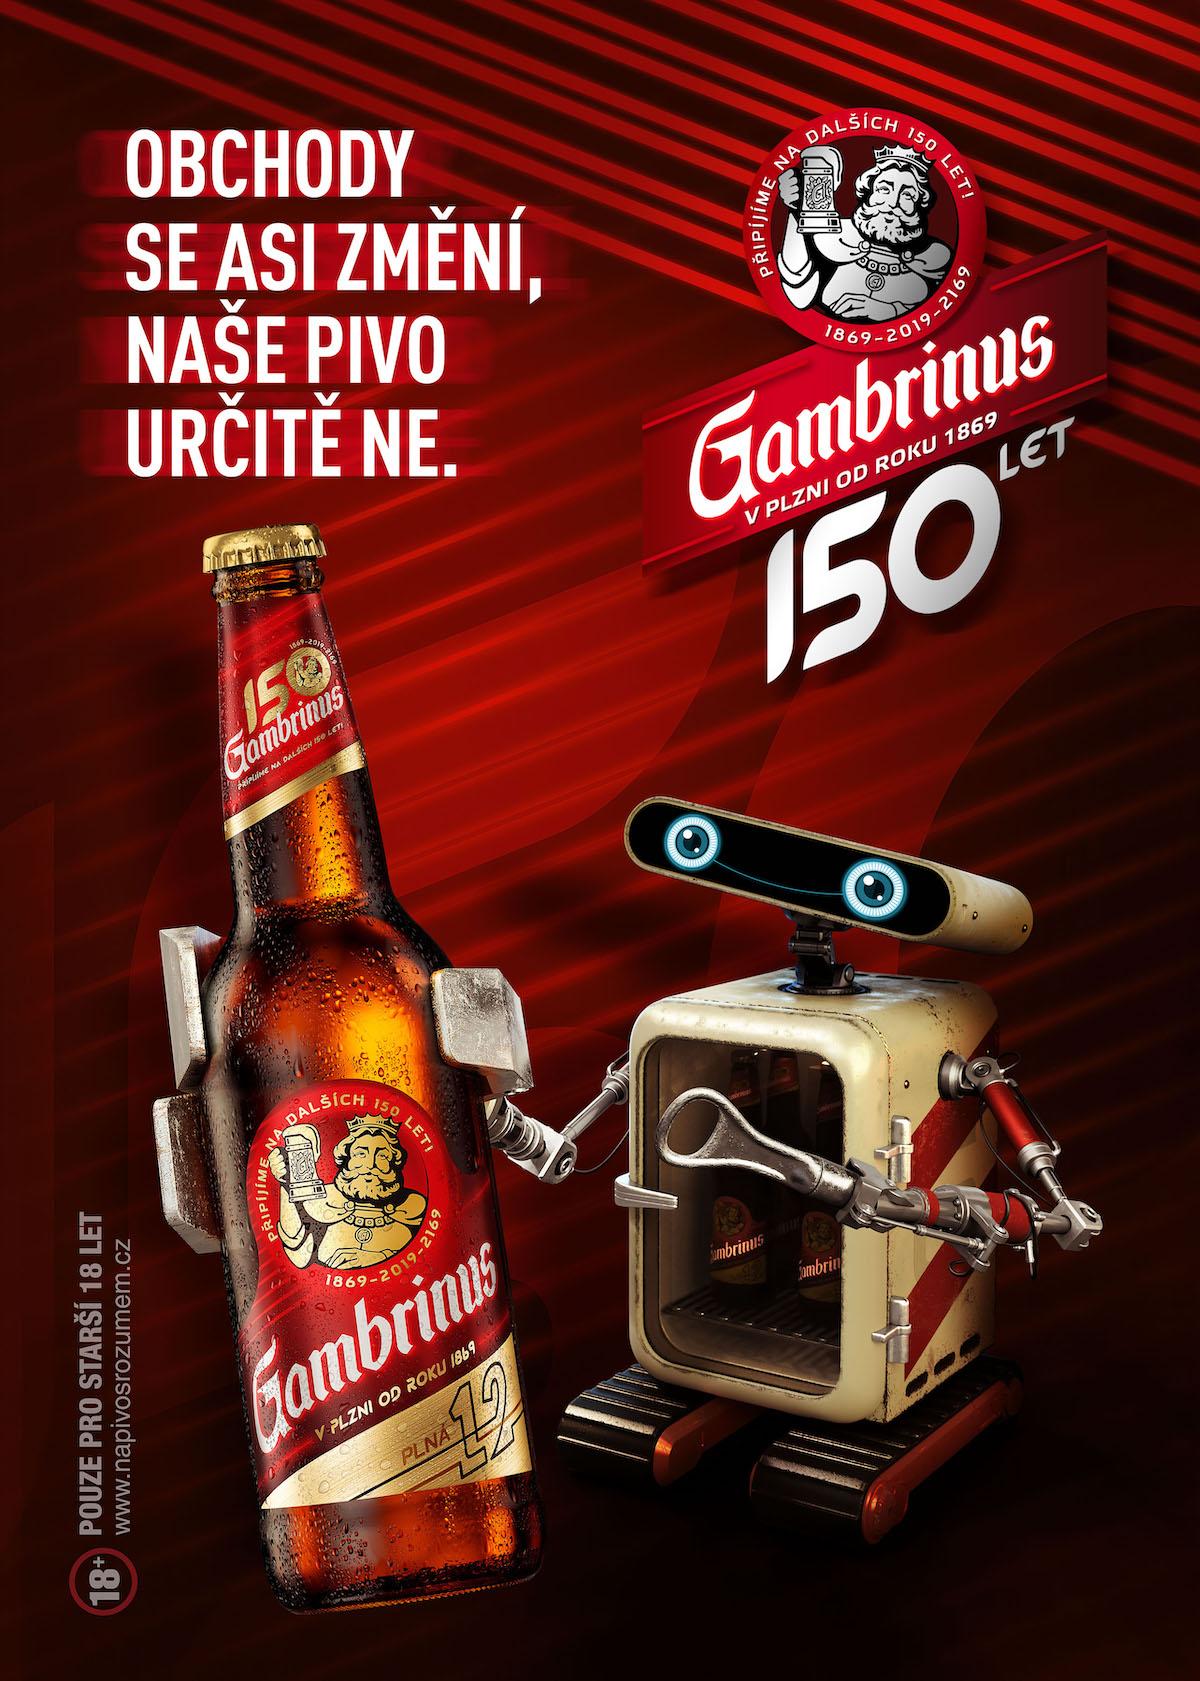 Gambrinus: Na dalších 150 let (McCann)